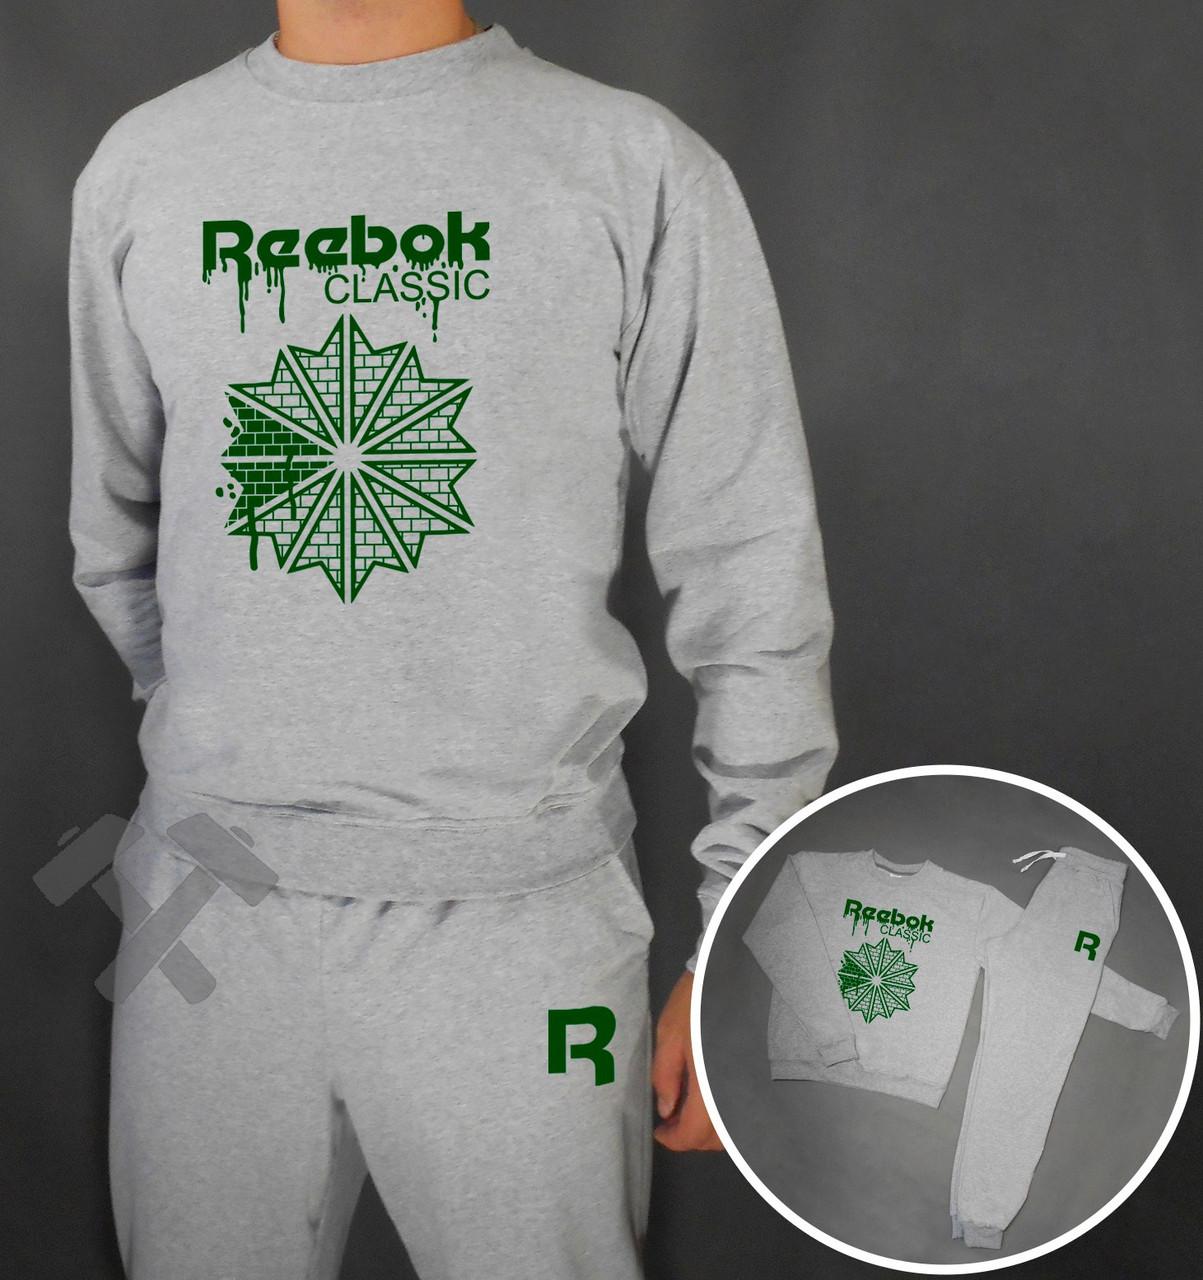 Спортивный костюм Reebok Classic серого цвета